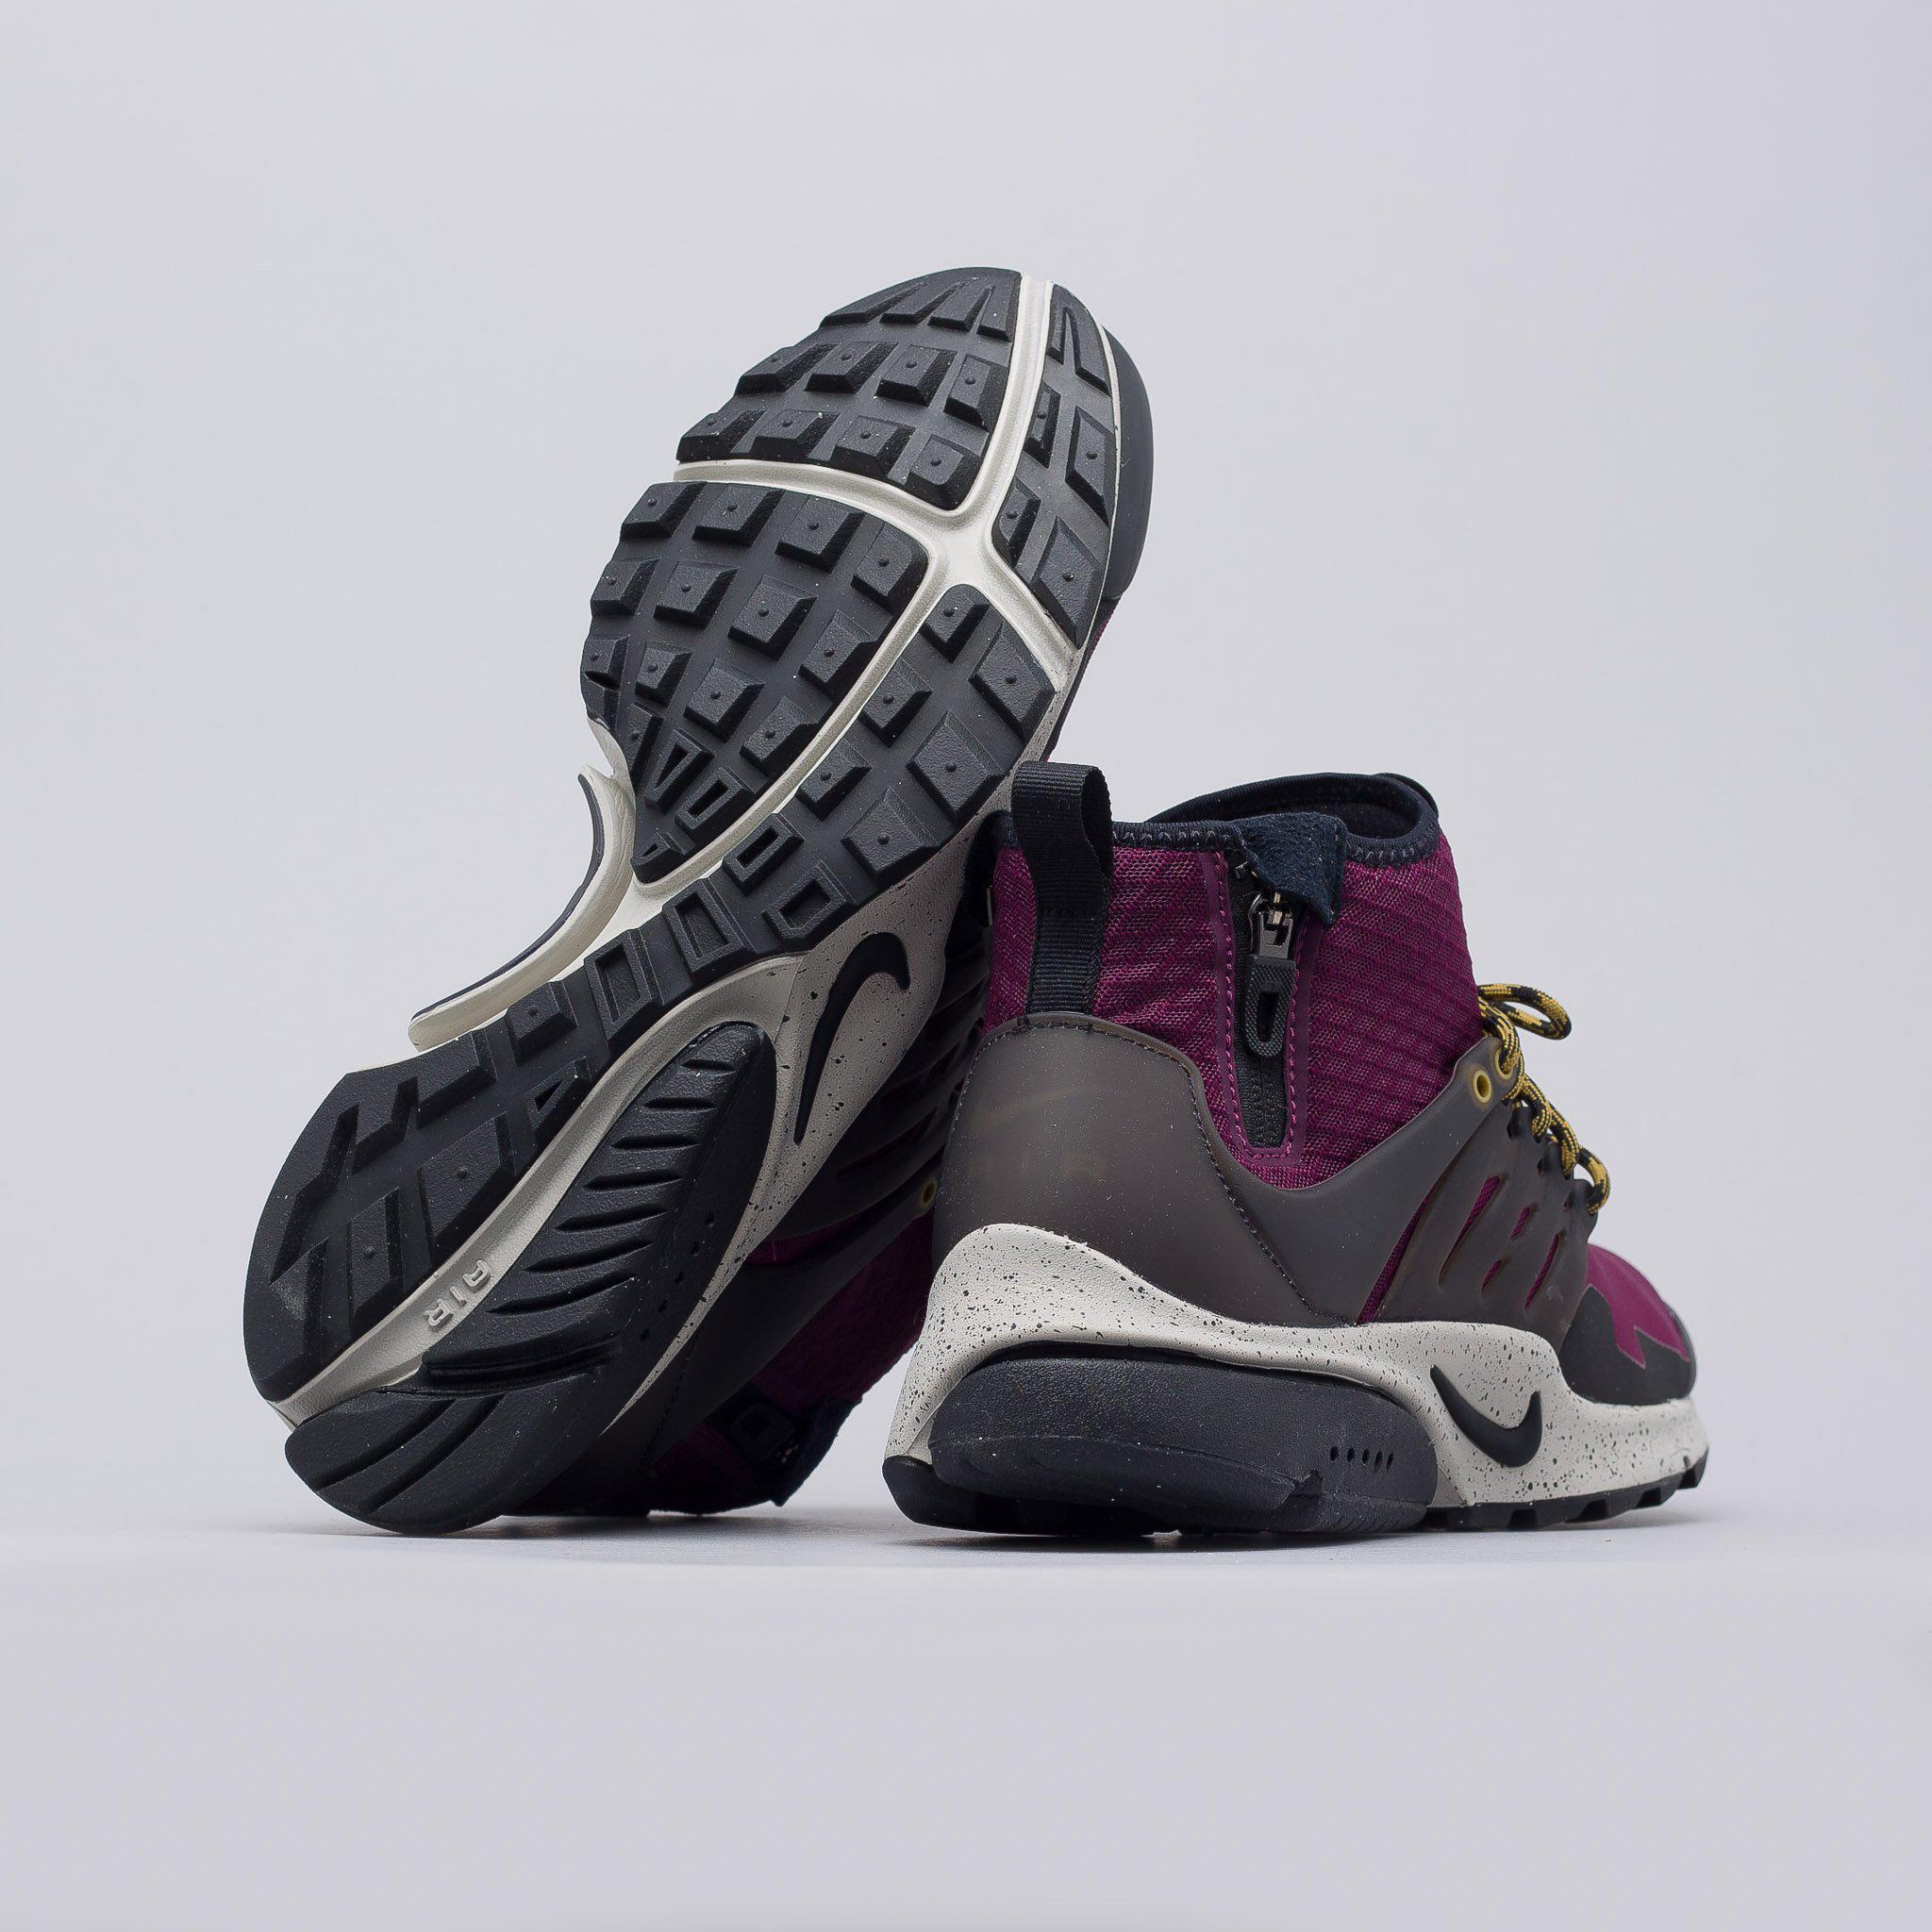 a2d34525dac3 Lyst - Nike Air Presto Mid Utility In Bordeaux for Men